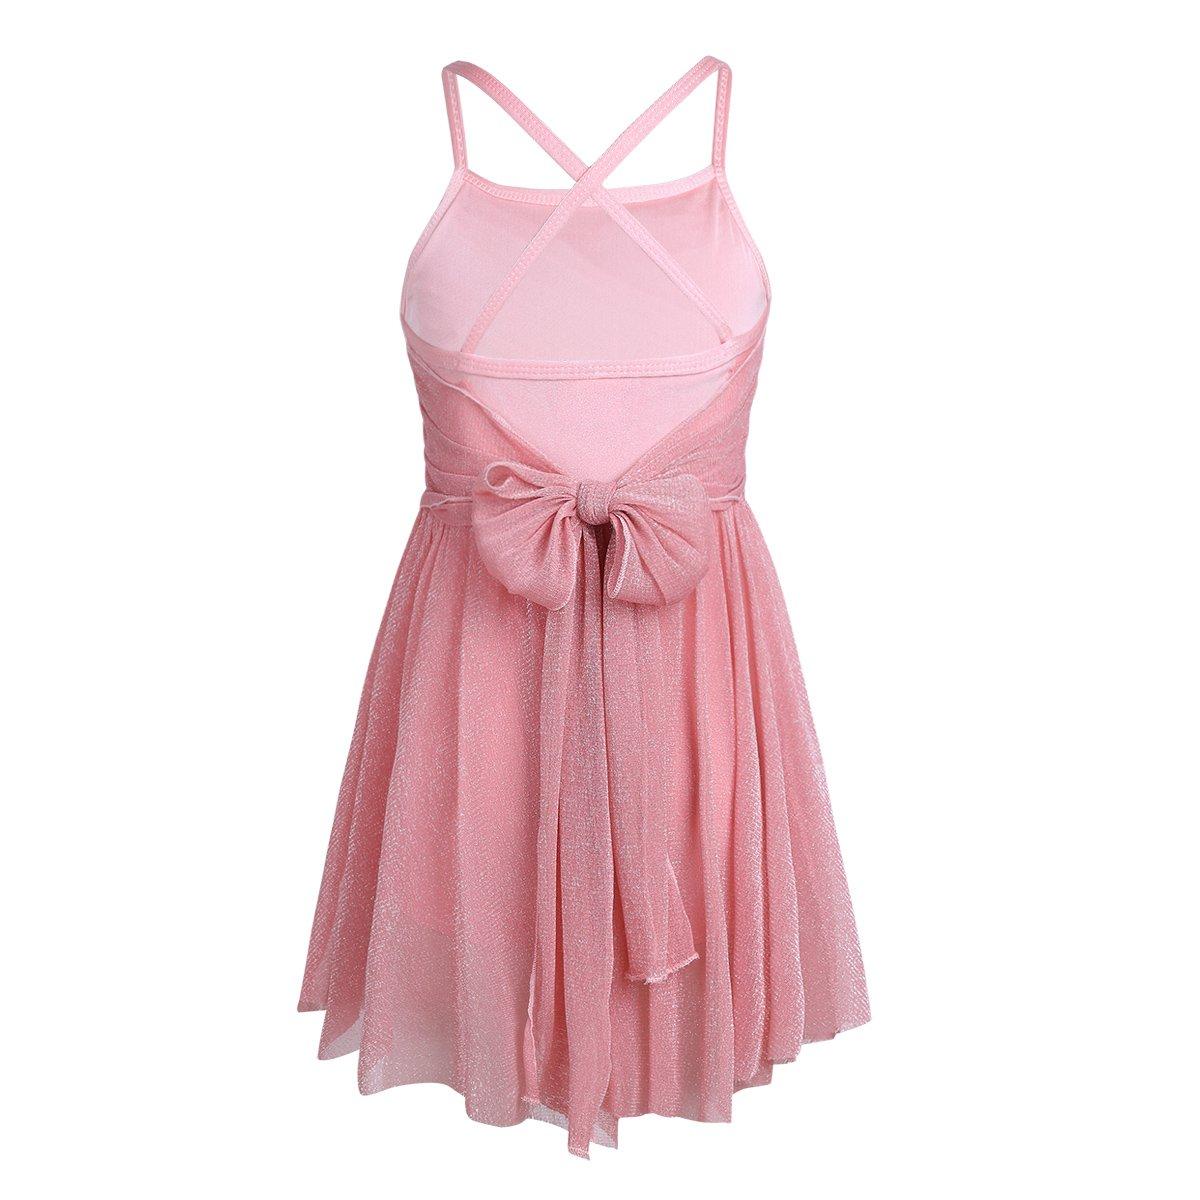 65294cd4bd5f Amazon.com: YiZYiF Girls' Glittery Mesh Overlay Lyrical Dance Dress Stage  Ballet Ballroom Dancing Costumes: Clothing